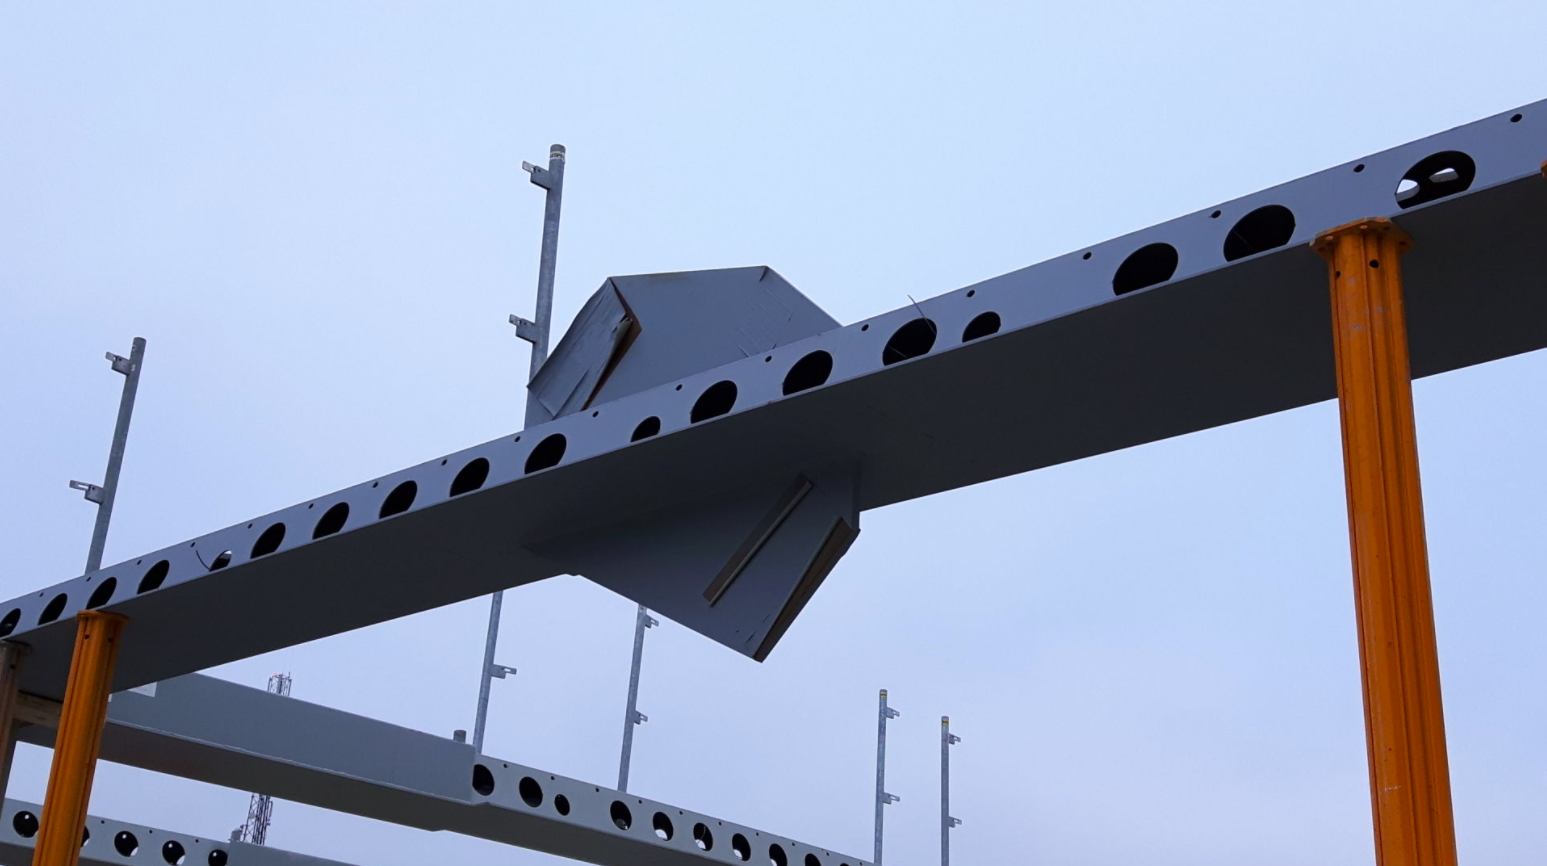 IDEA StatiCa UK - ICON Vaxjo project - Steel beam